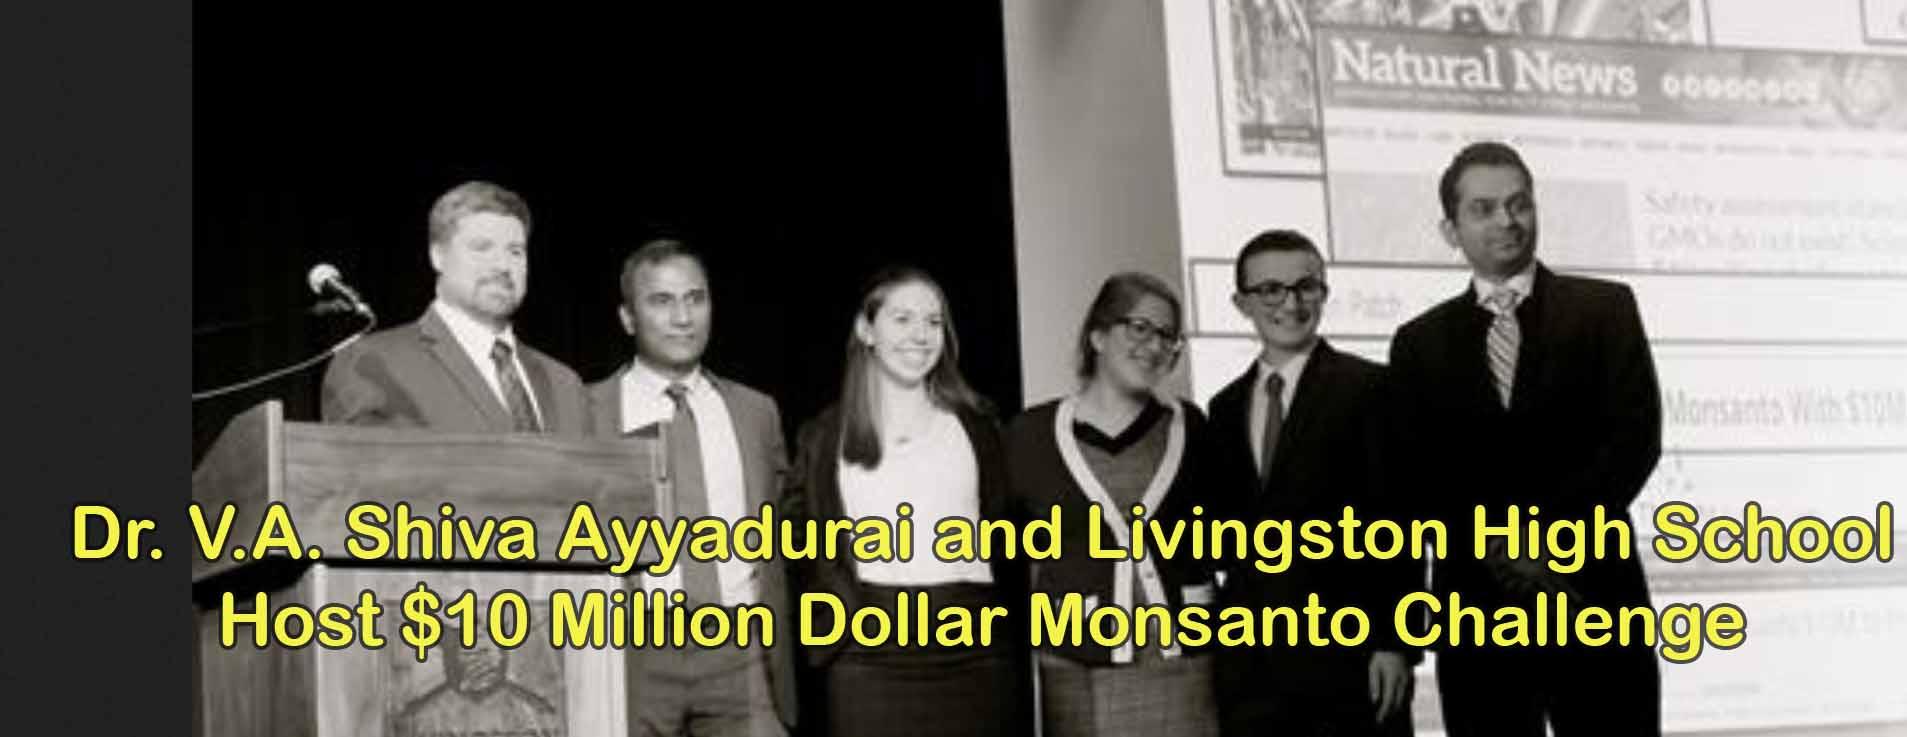 Dr. V.A. Shiva Ayyadurai And Livingston High School Host $10 Million Dollar Monsanto Challenge